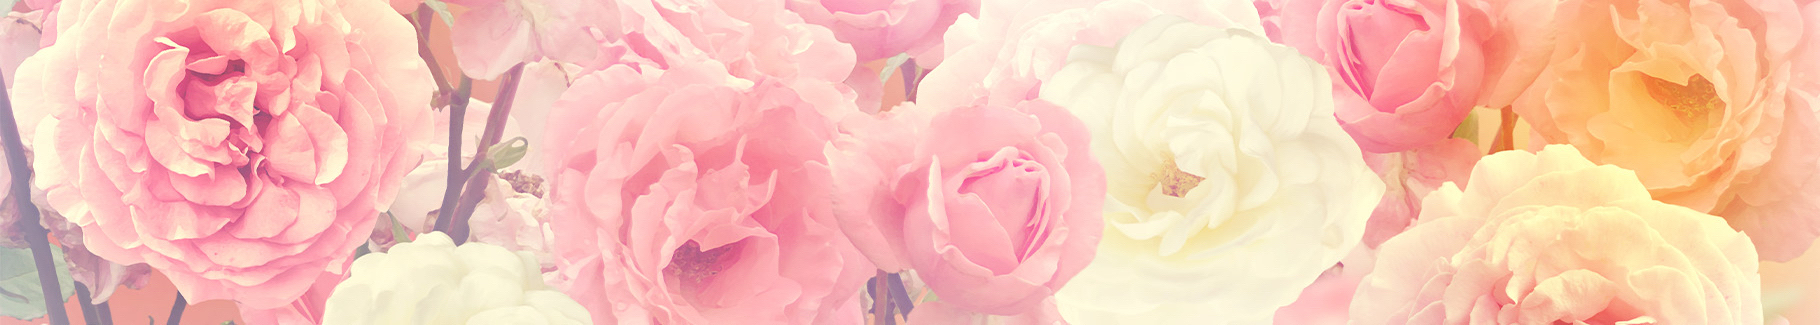 Fototapeta kolorowe róże